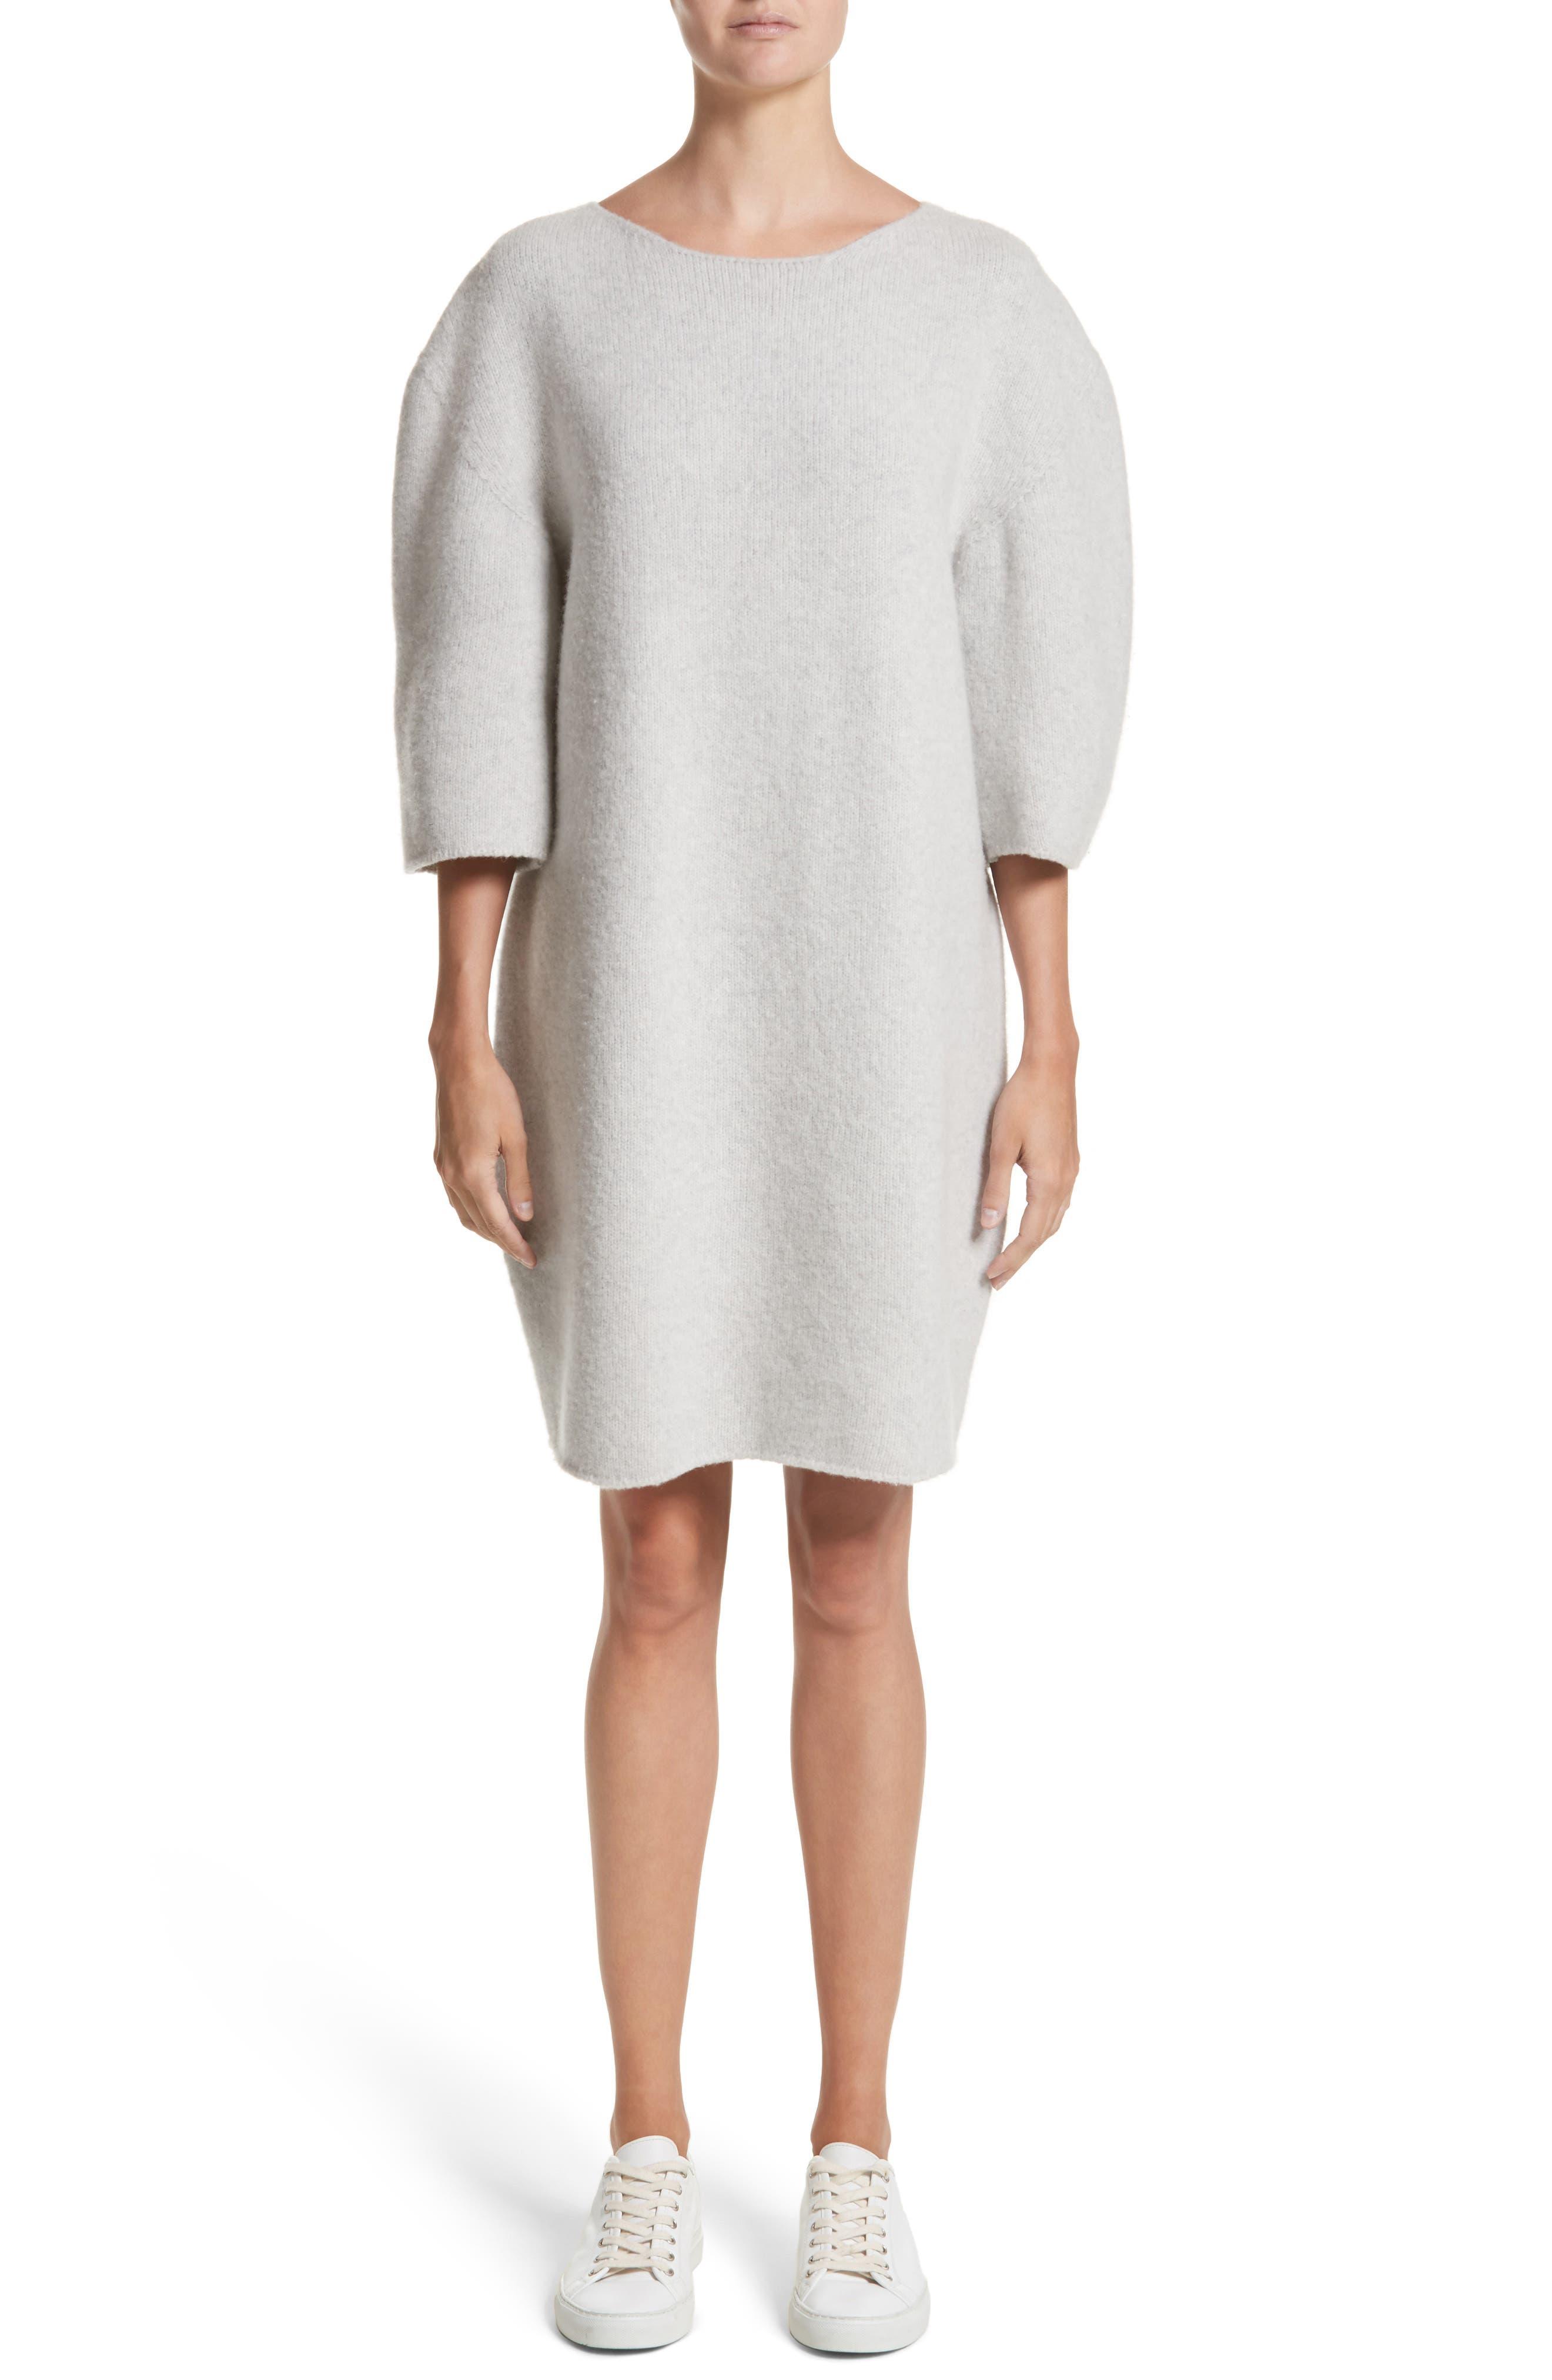 Baseball Wool Sweater Dress,                             Main thumbnail 1, color,                             Silver Melange